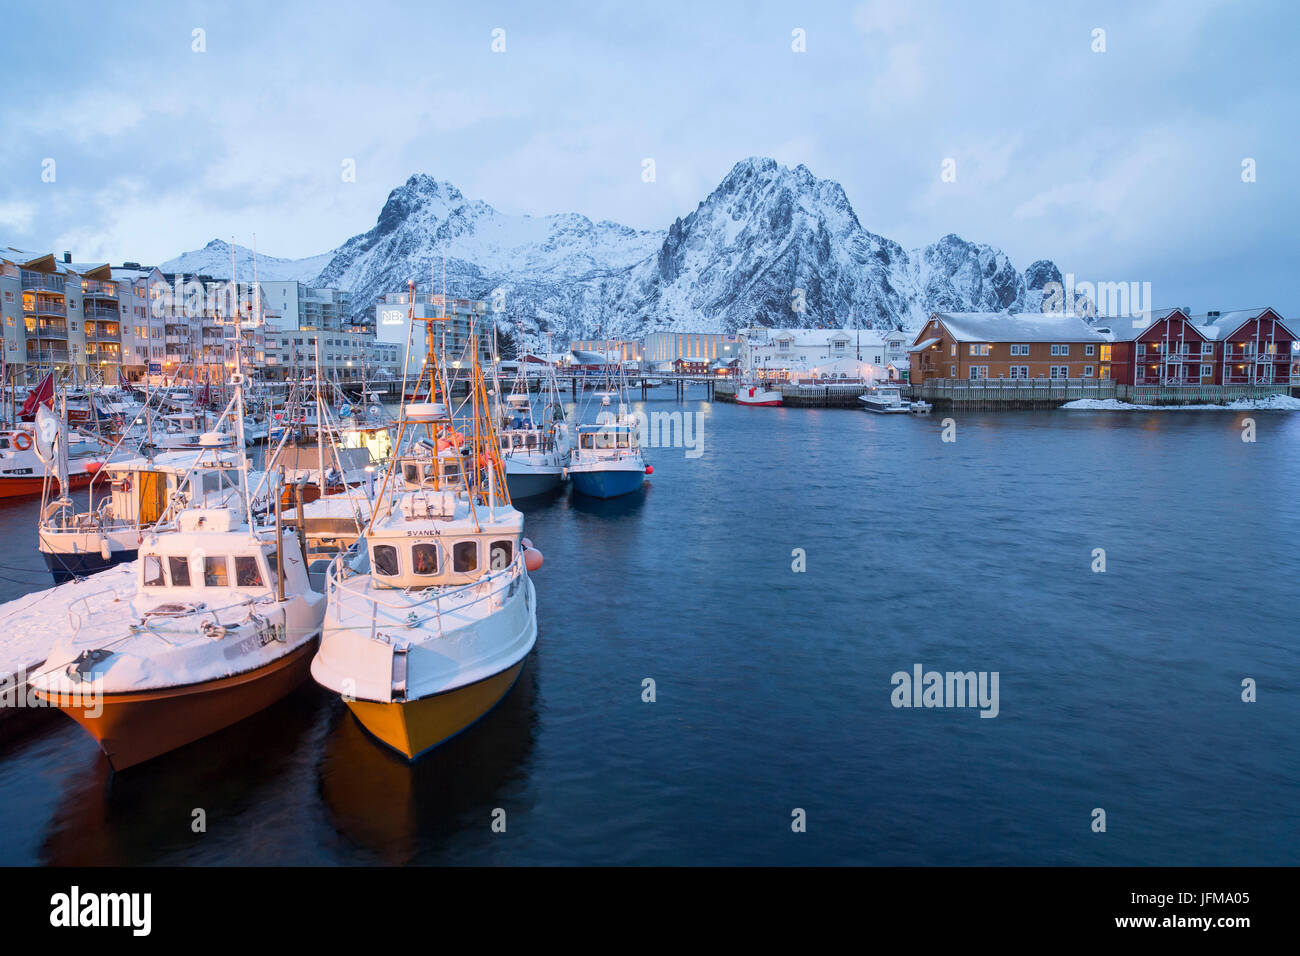 Fishing boats lined up in The port of Henningsvær Fishing Village, Lofoten Islands, Norway - Stock Image